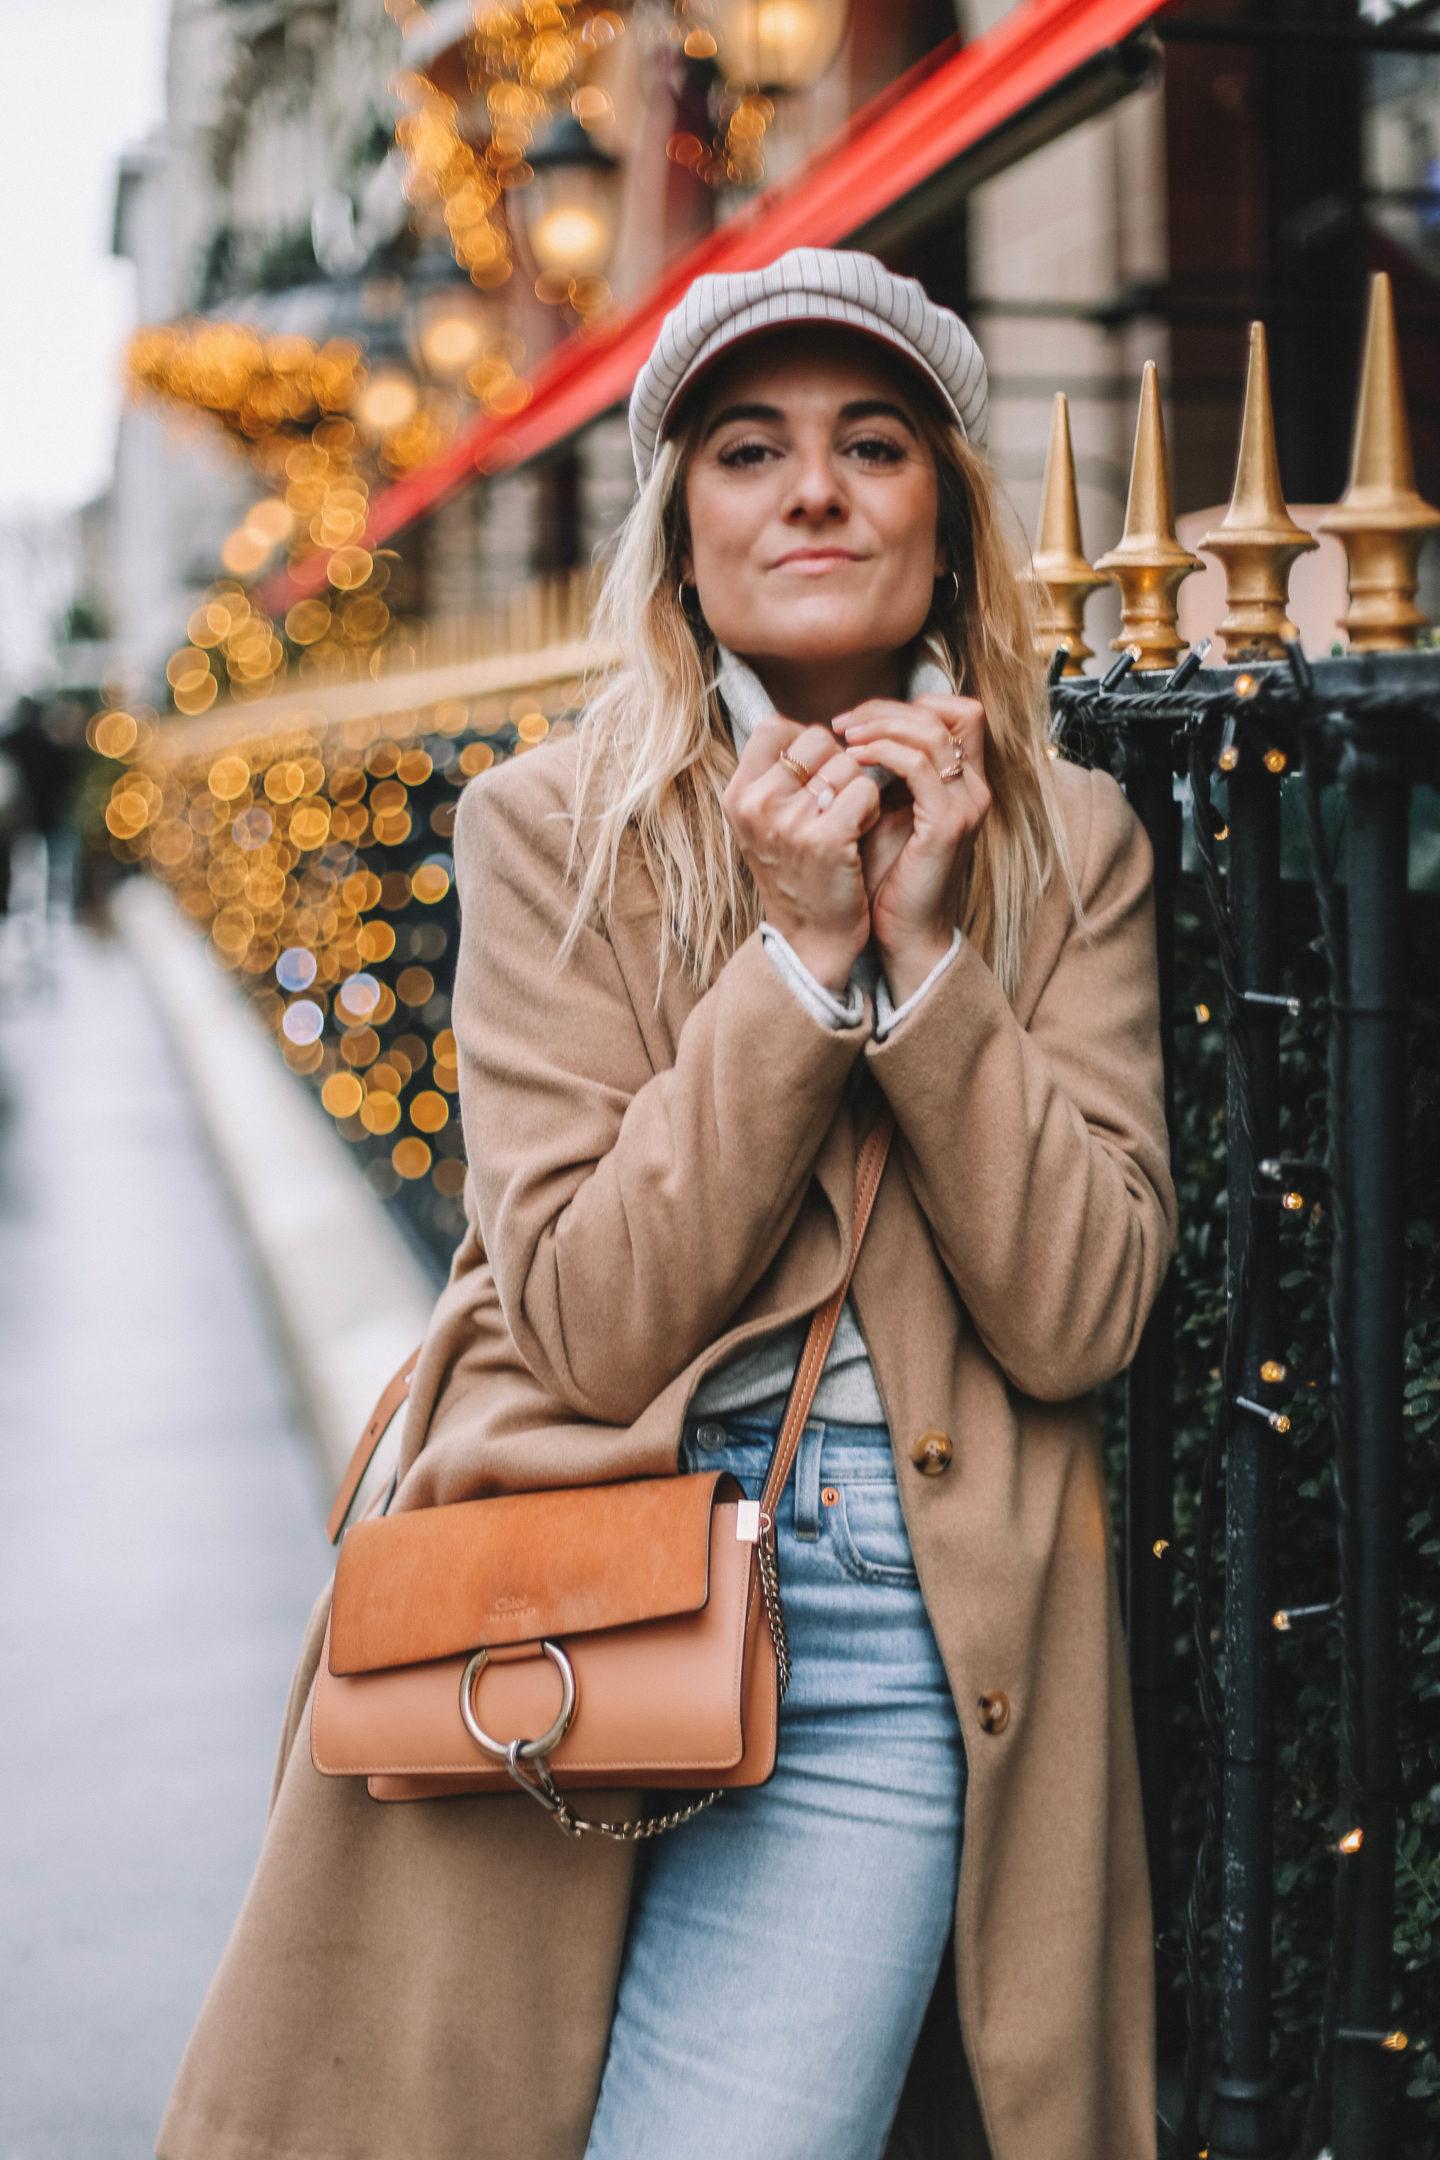 Blog mode Paris - Blondie Baby blog mode et voyages